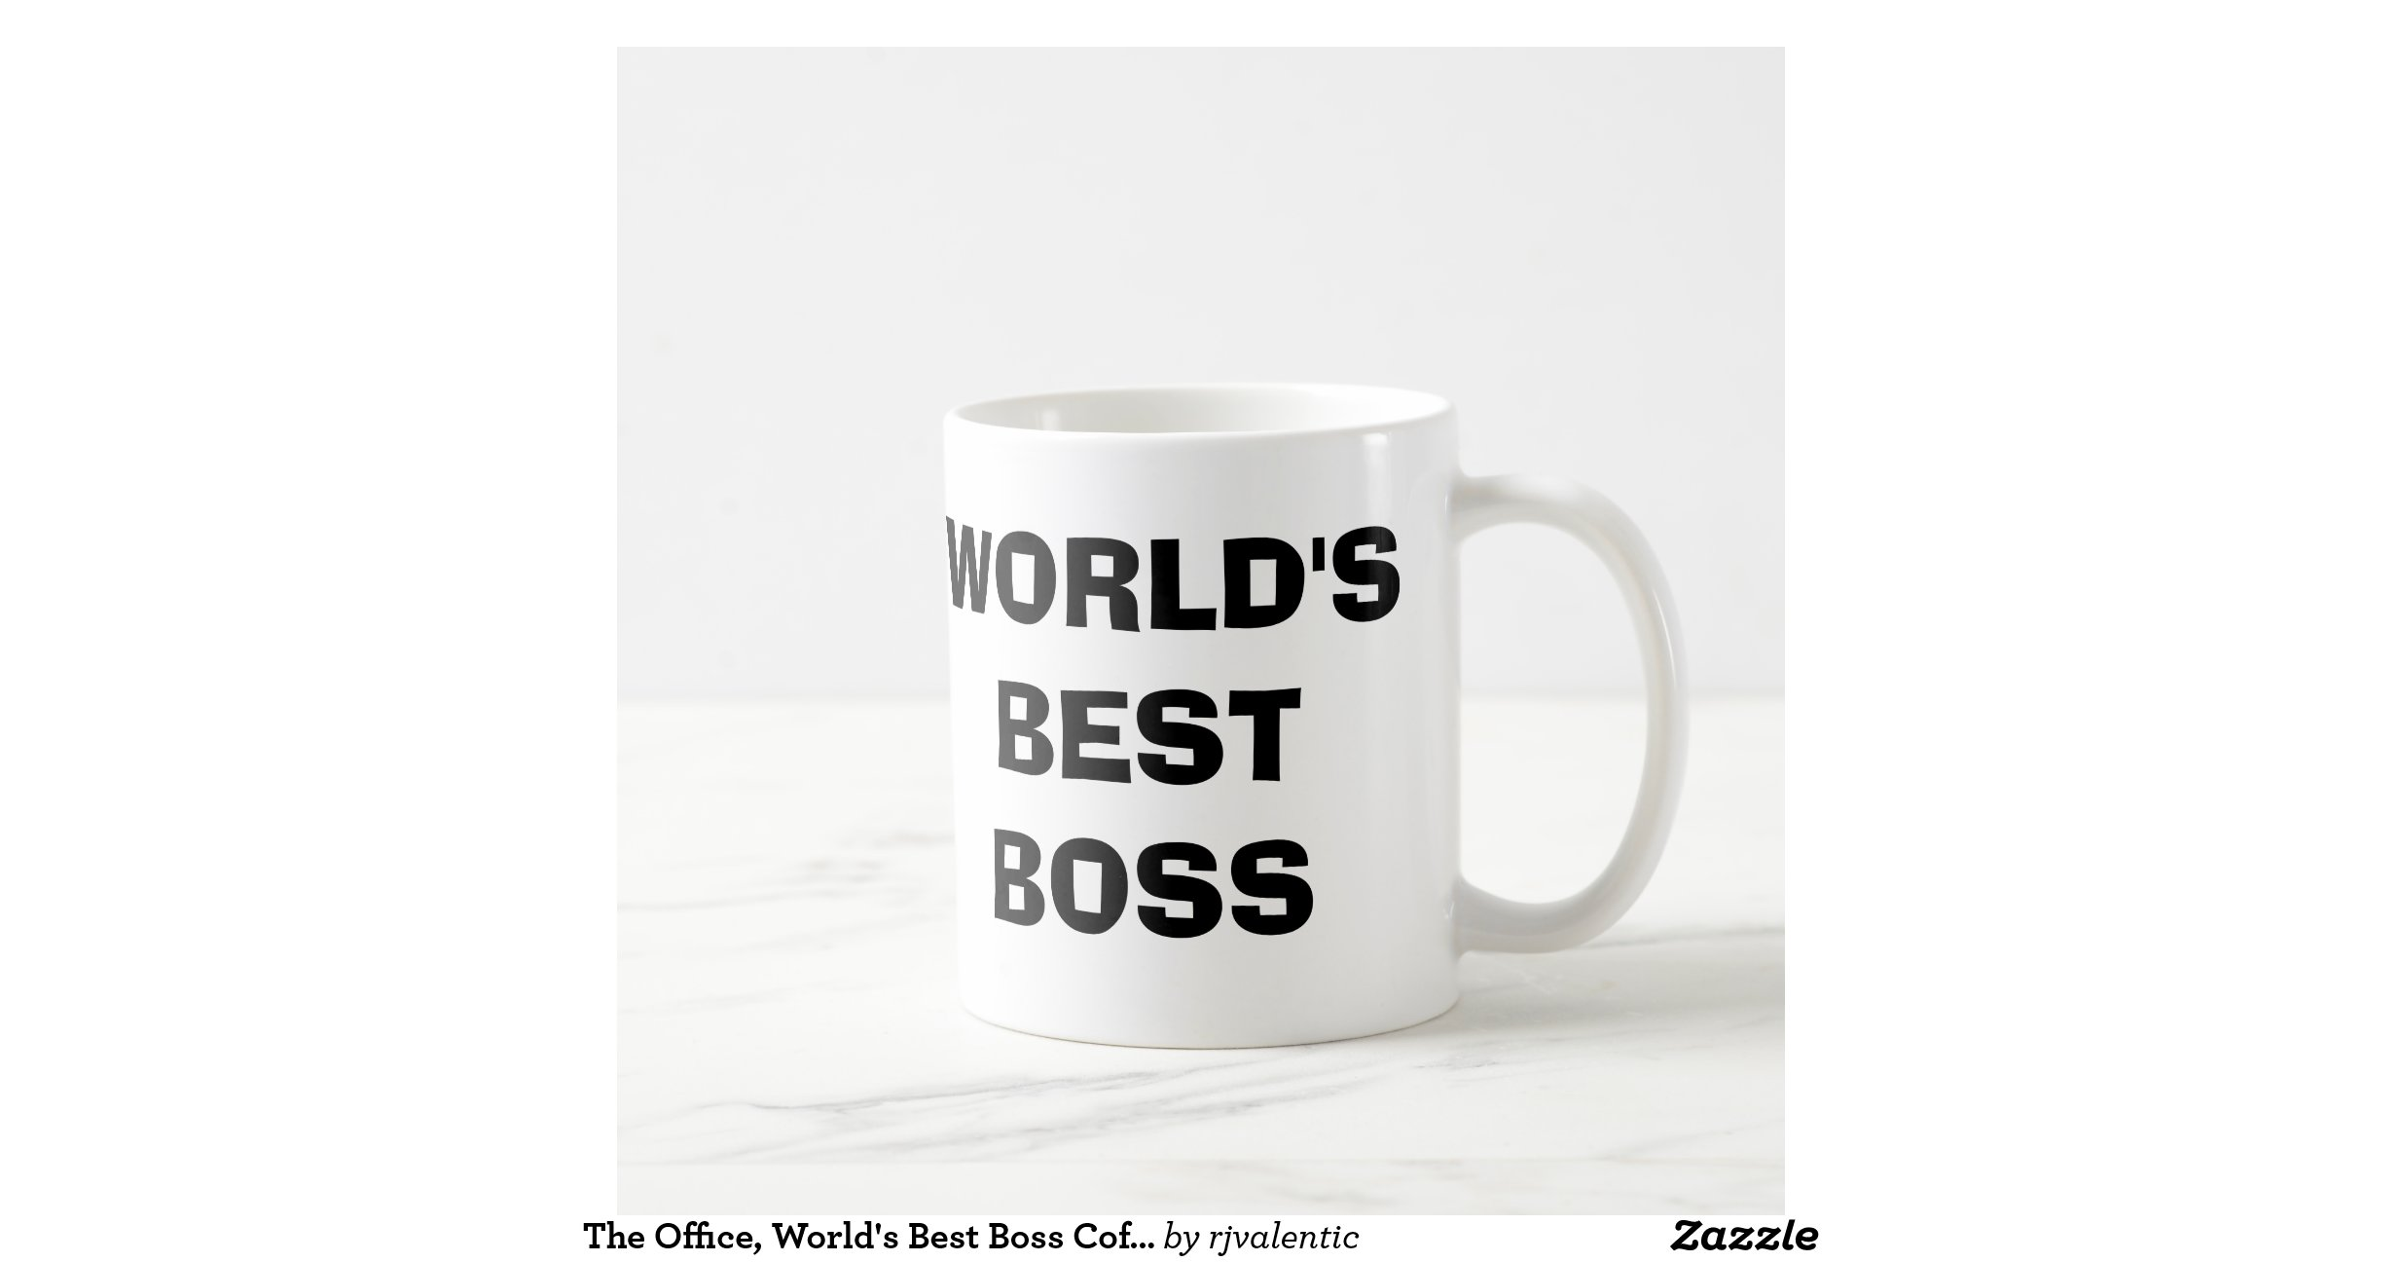 The Office Worlds Best Boss Coffee Mug